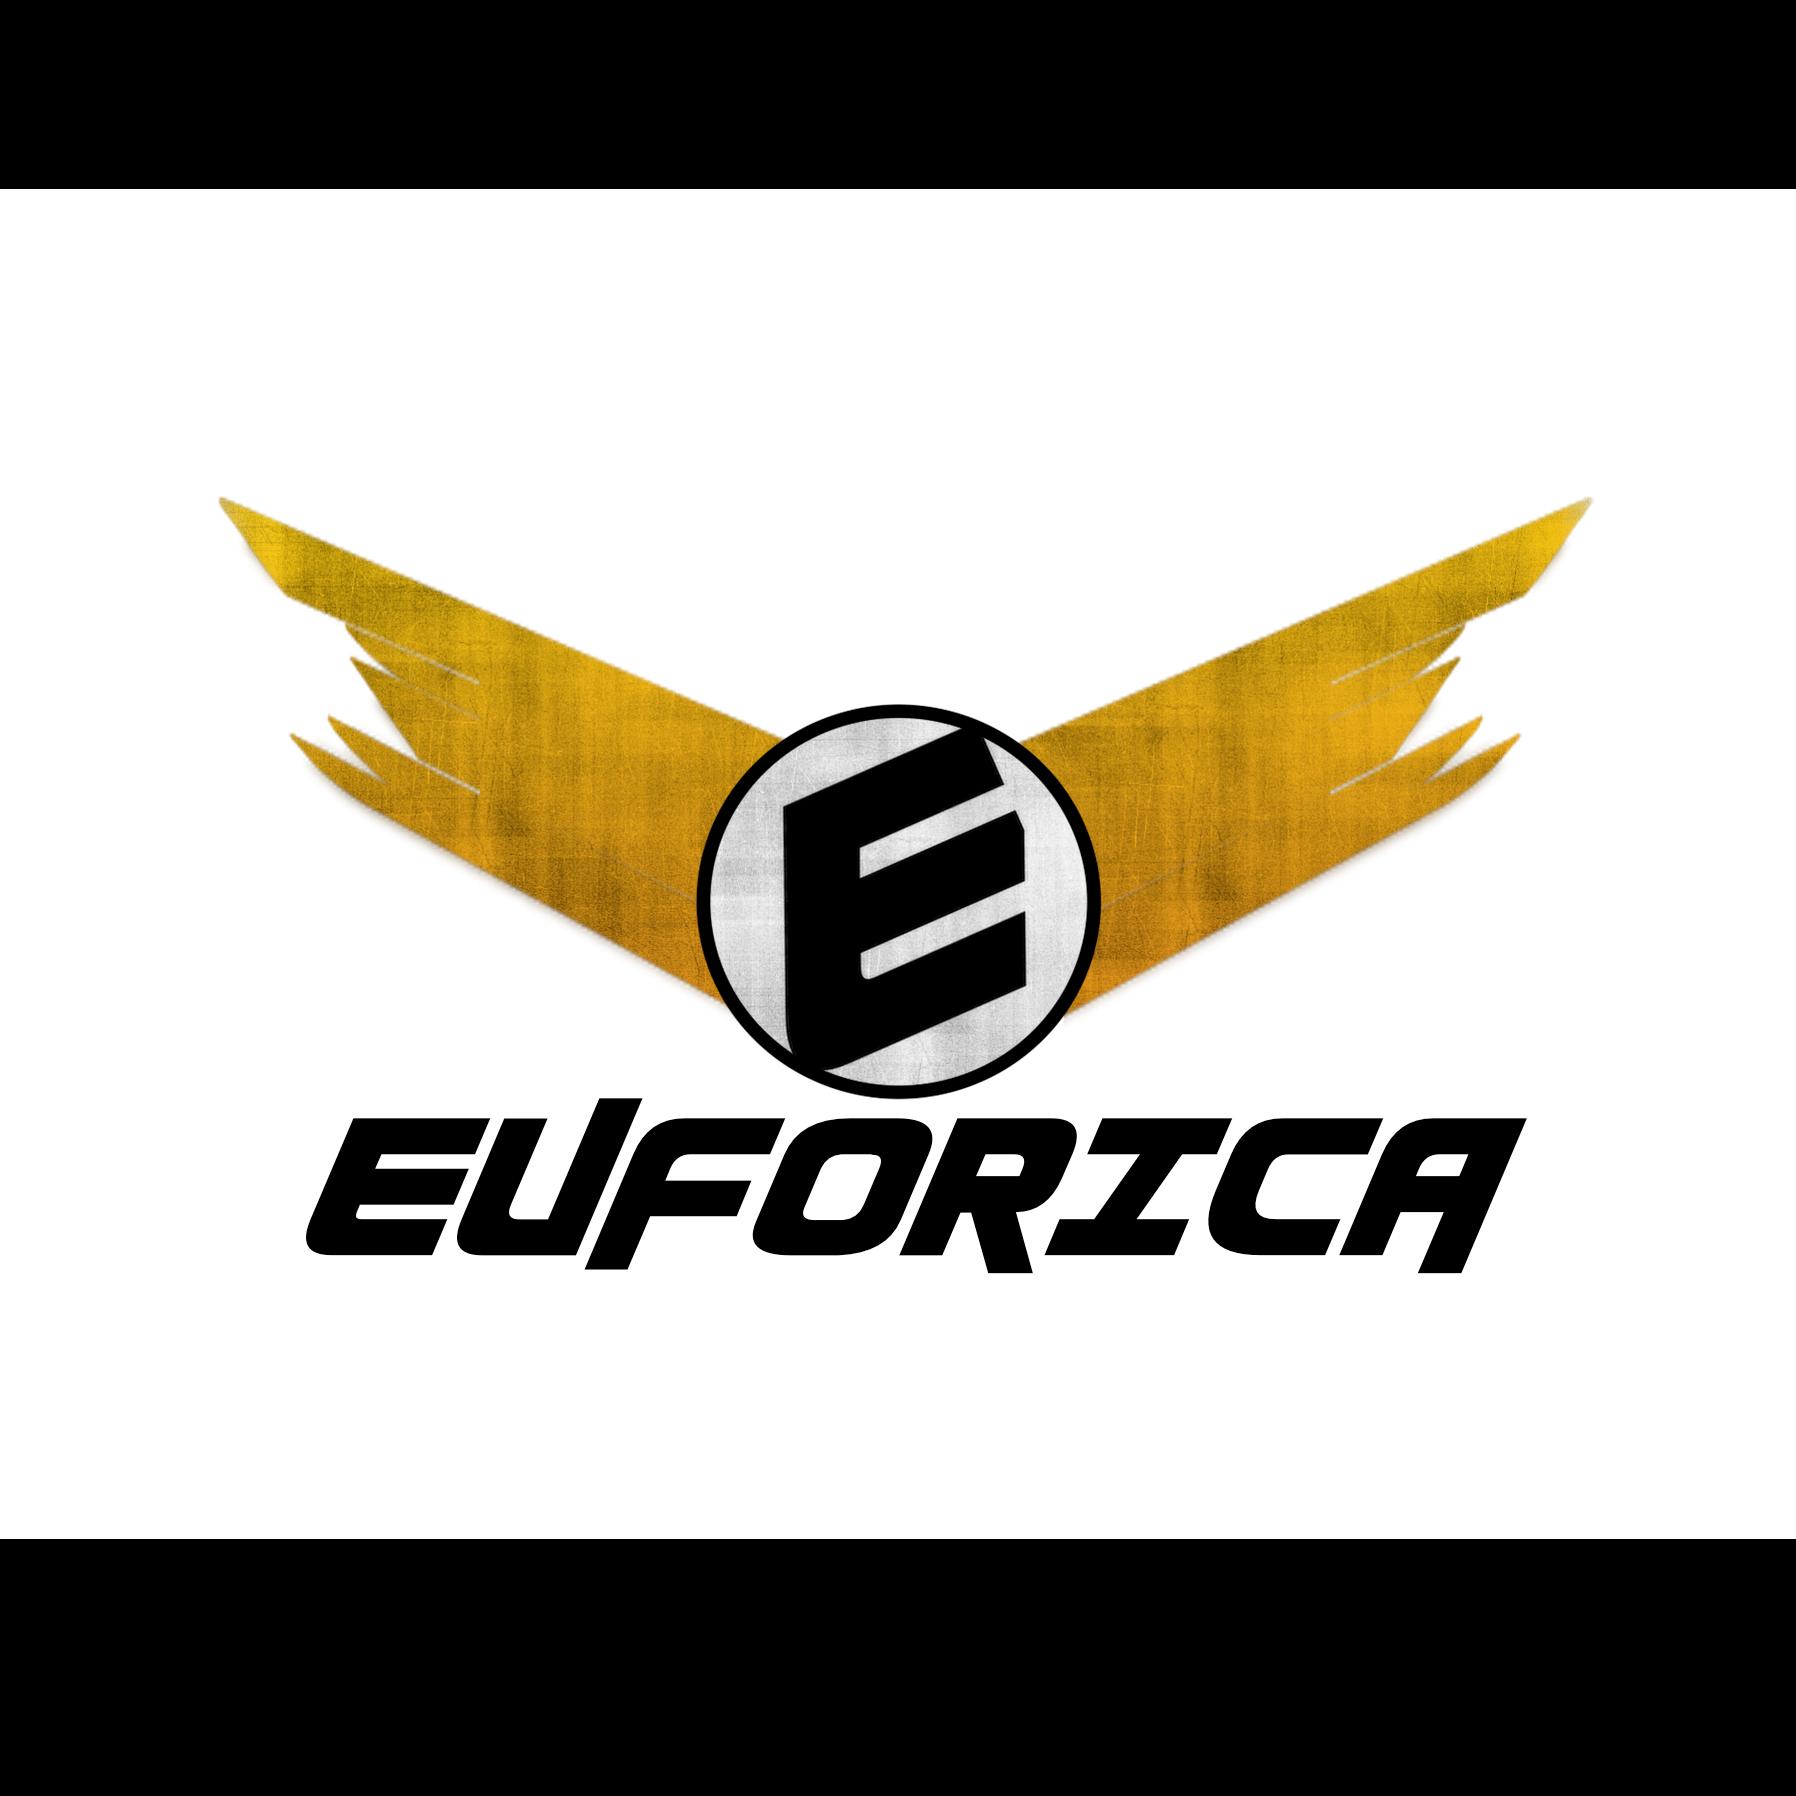 Euforica Radio